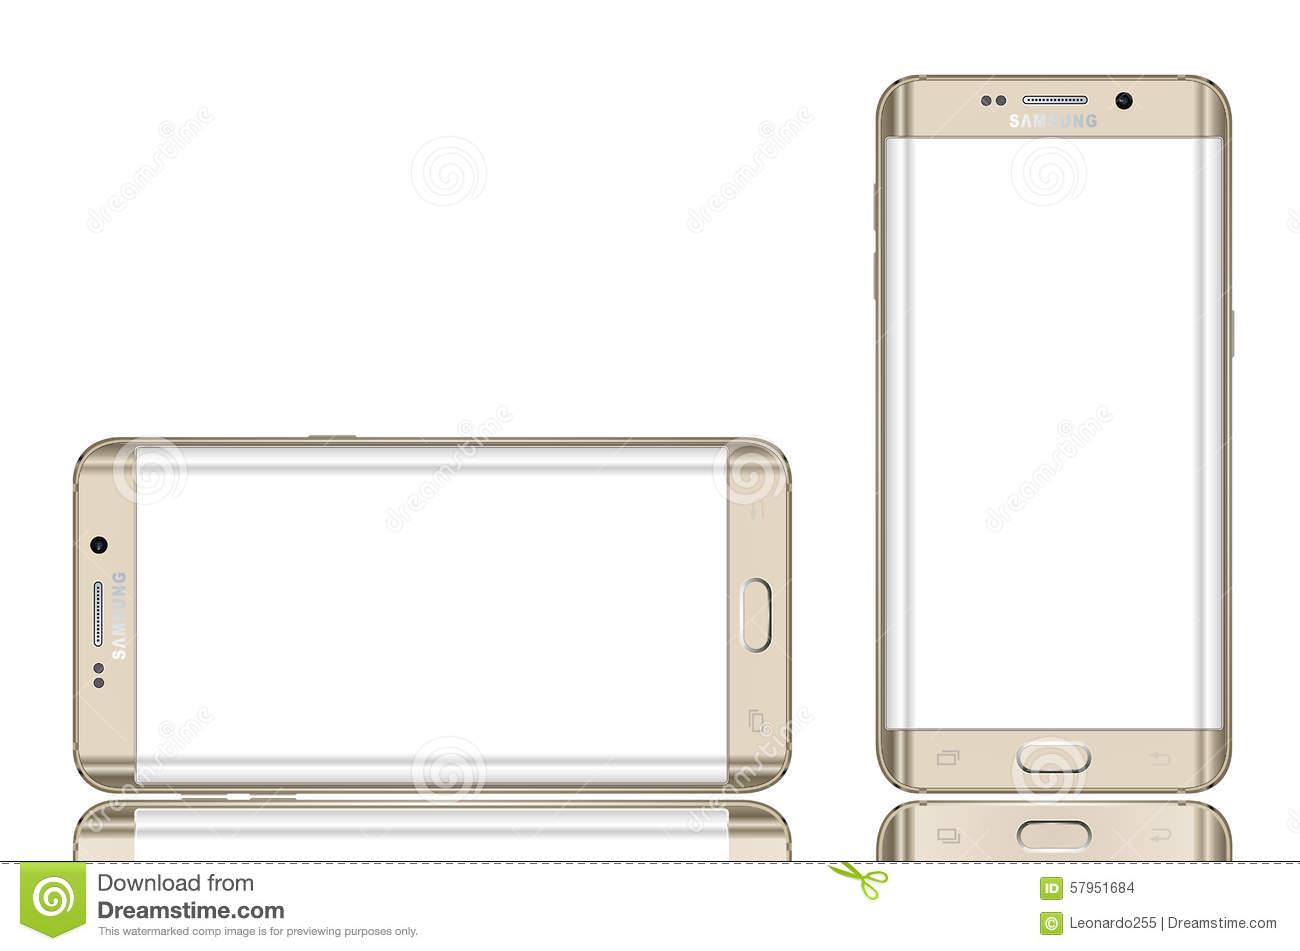 Samsung Galaxy S6 Clipart.